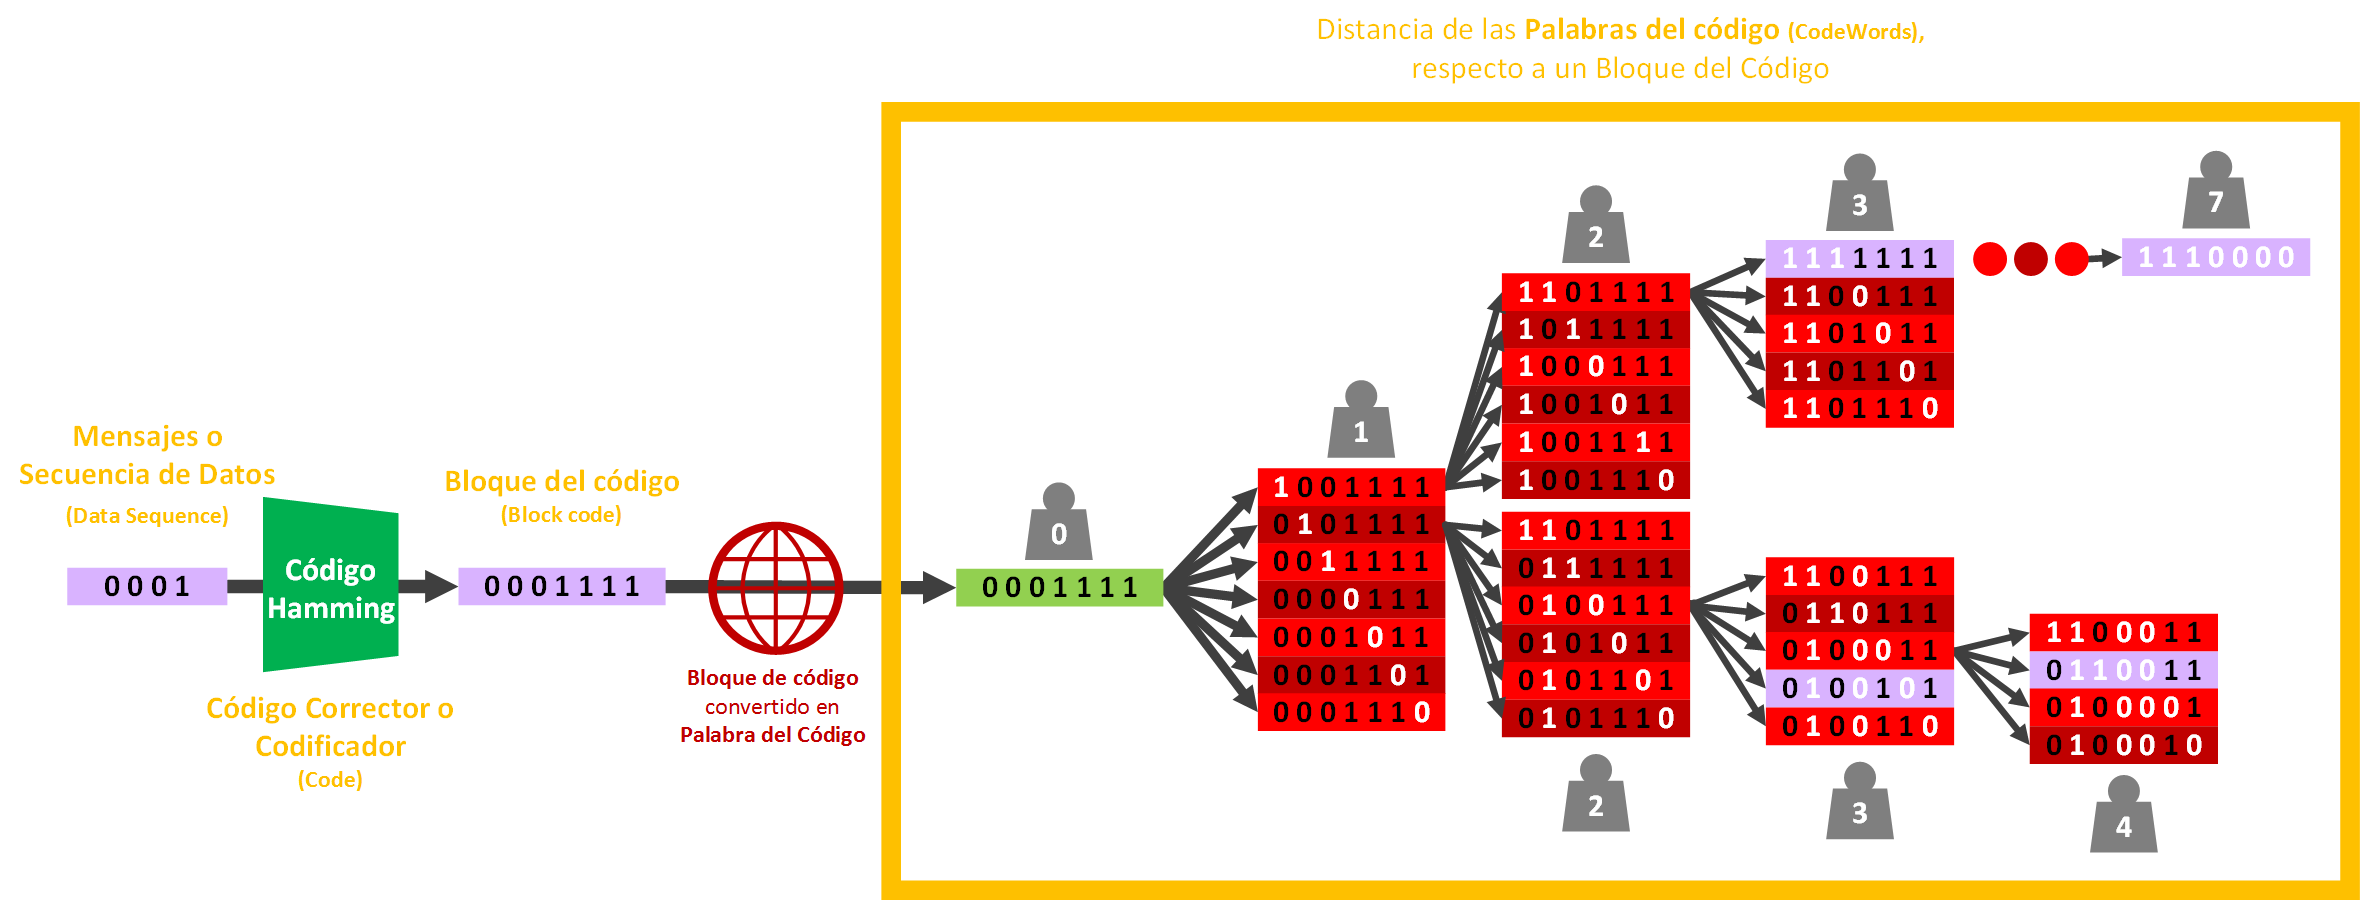 distancia-respecto-a-una-palabra-del-codigo-www-jarroba-com